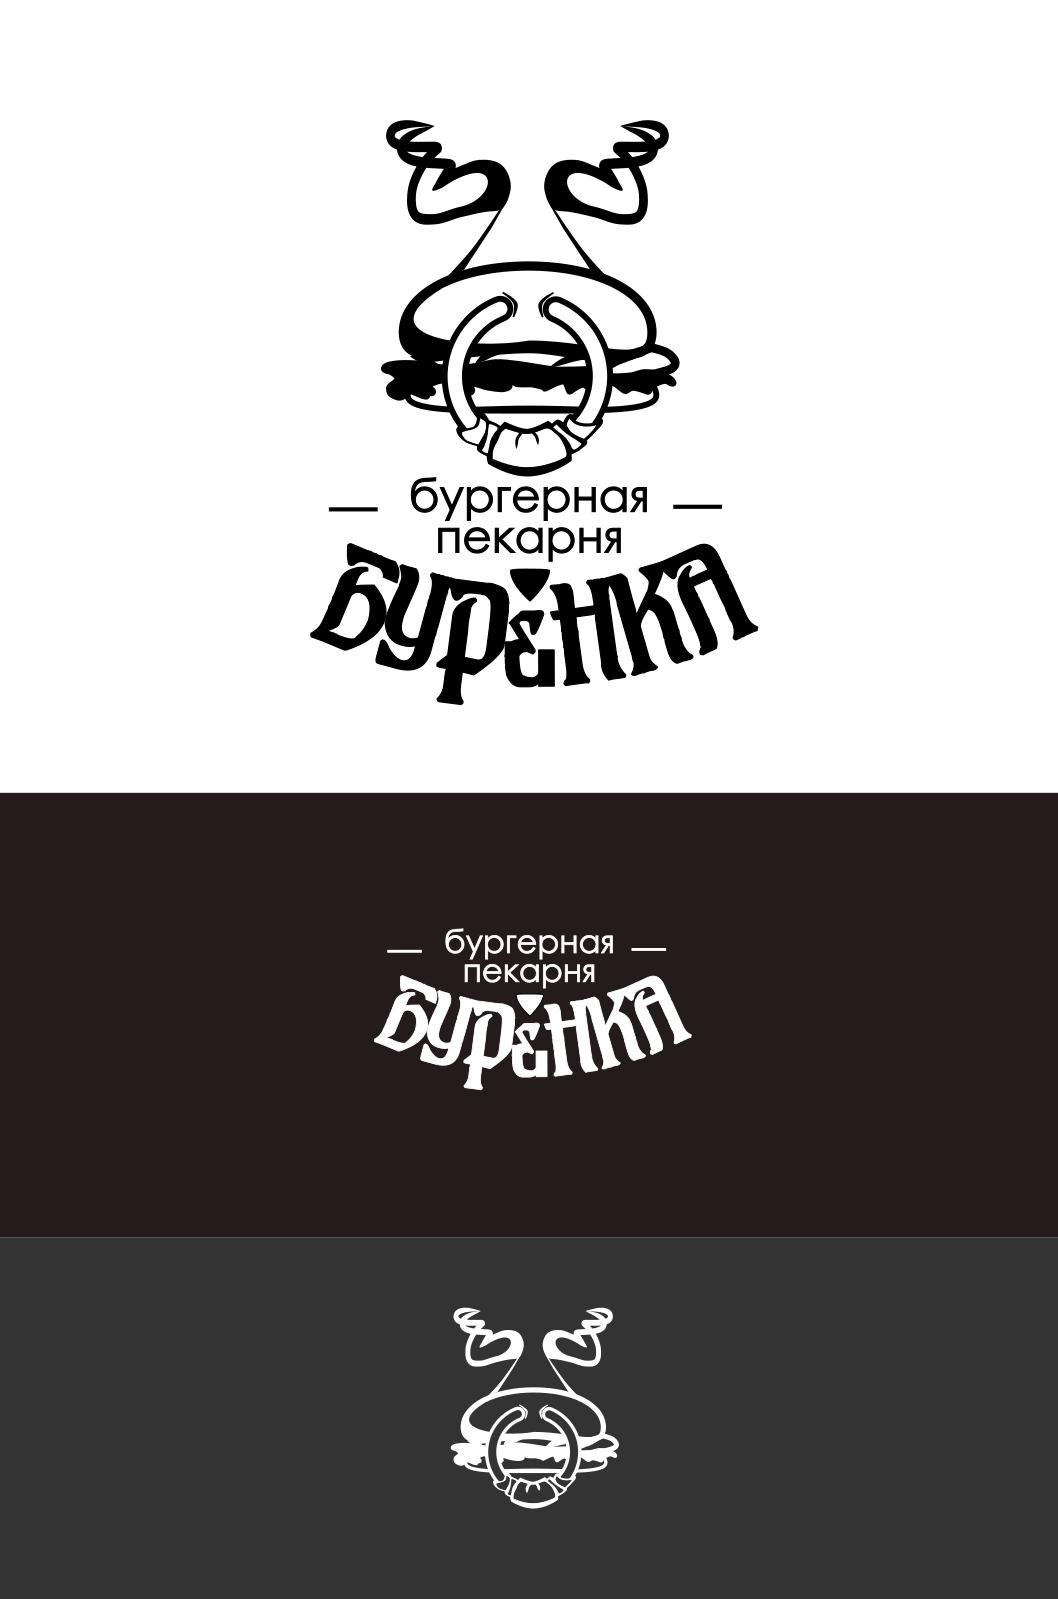 Логотип для Бургерной с Пекарней фото f_3865e10f9b15f78d.png